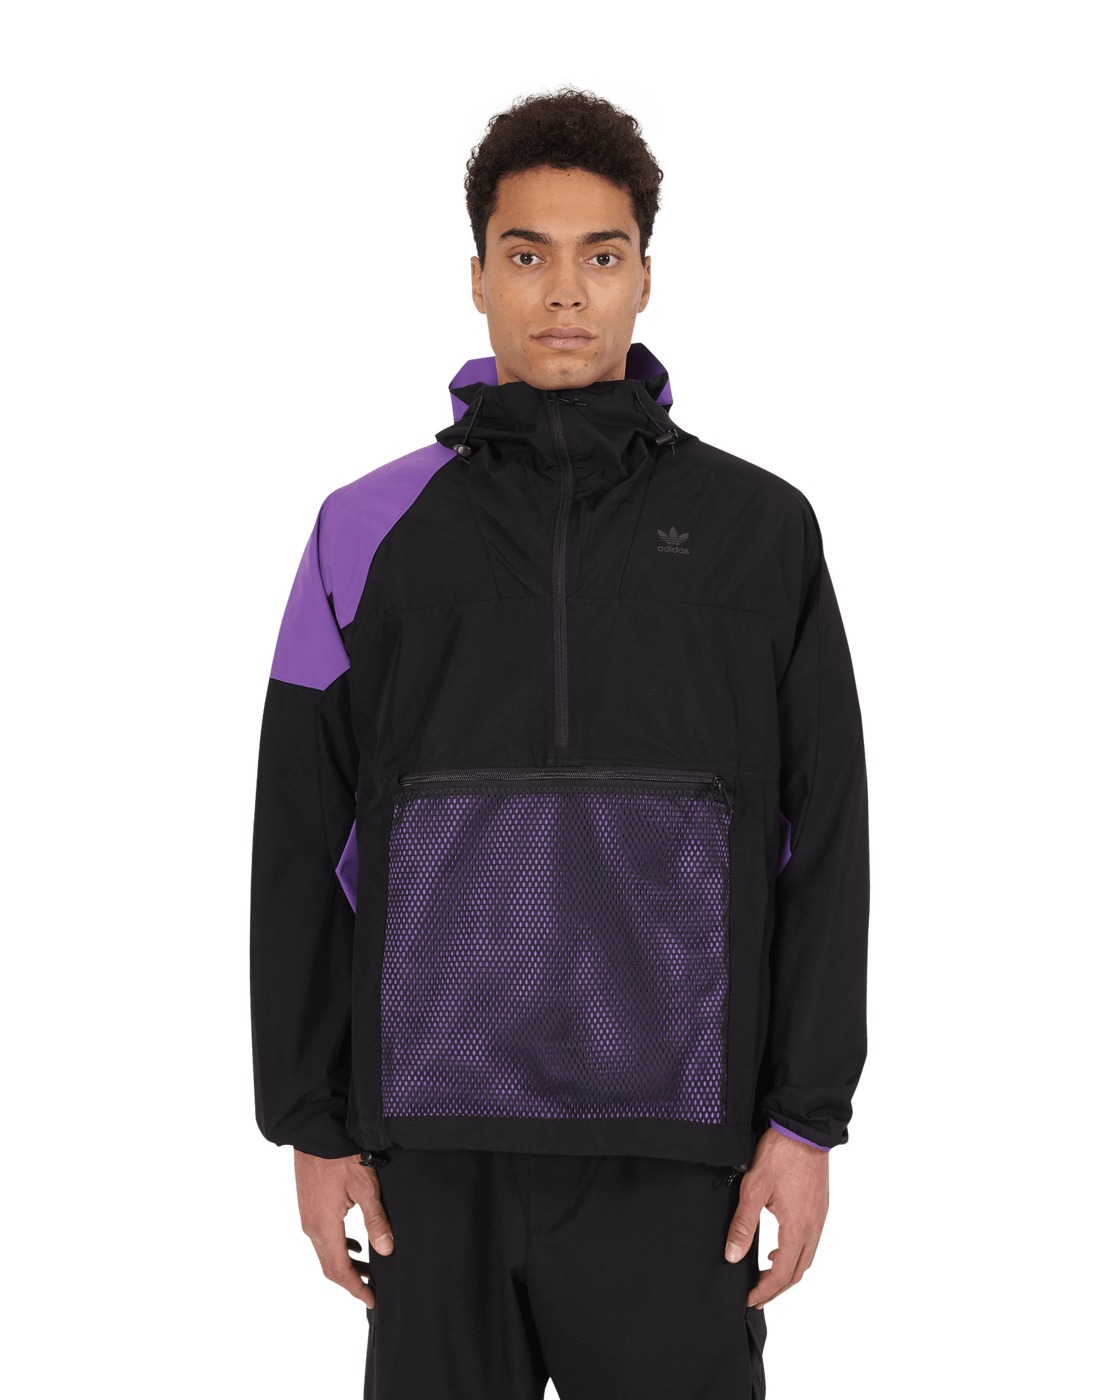 Adidas Originals Track Jacket Black/Actpur